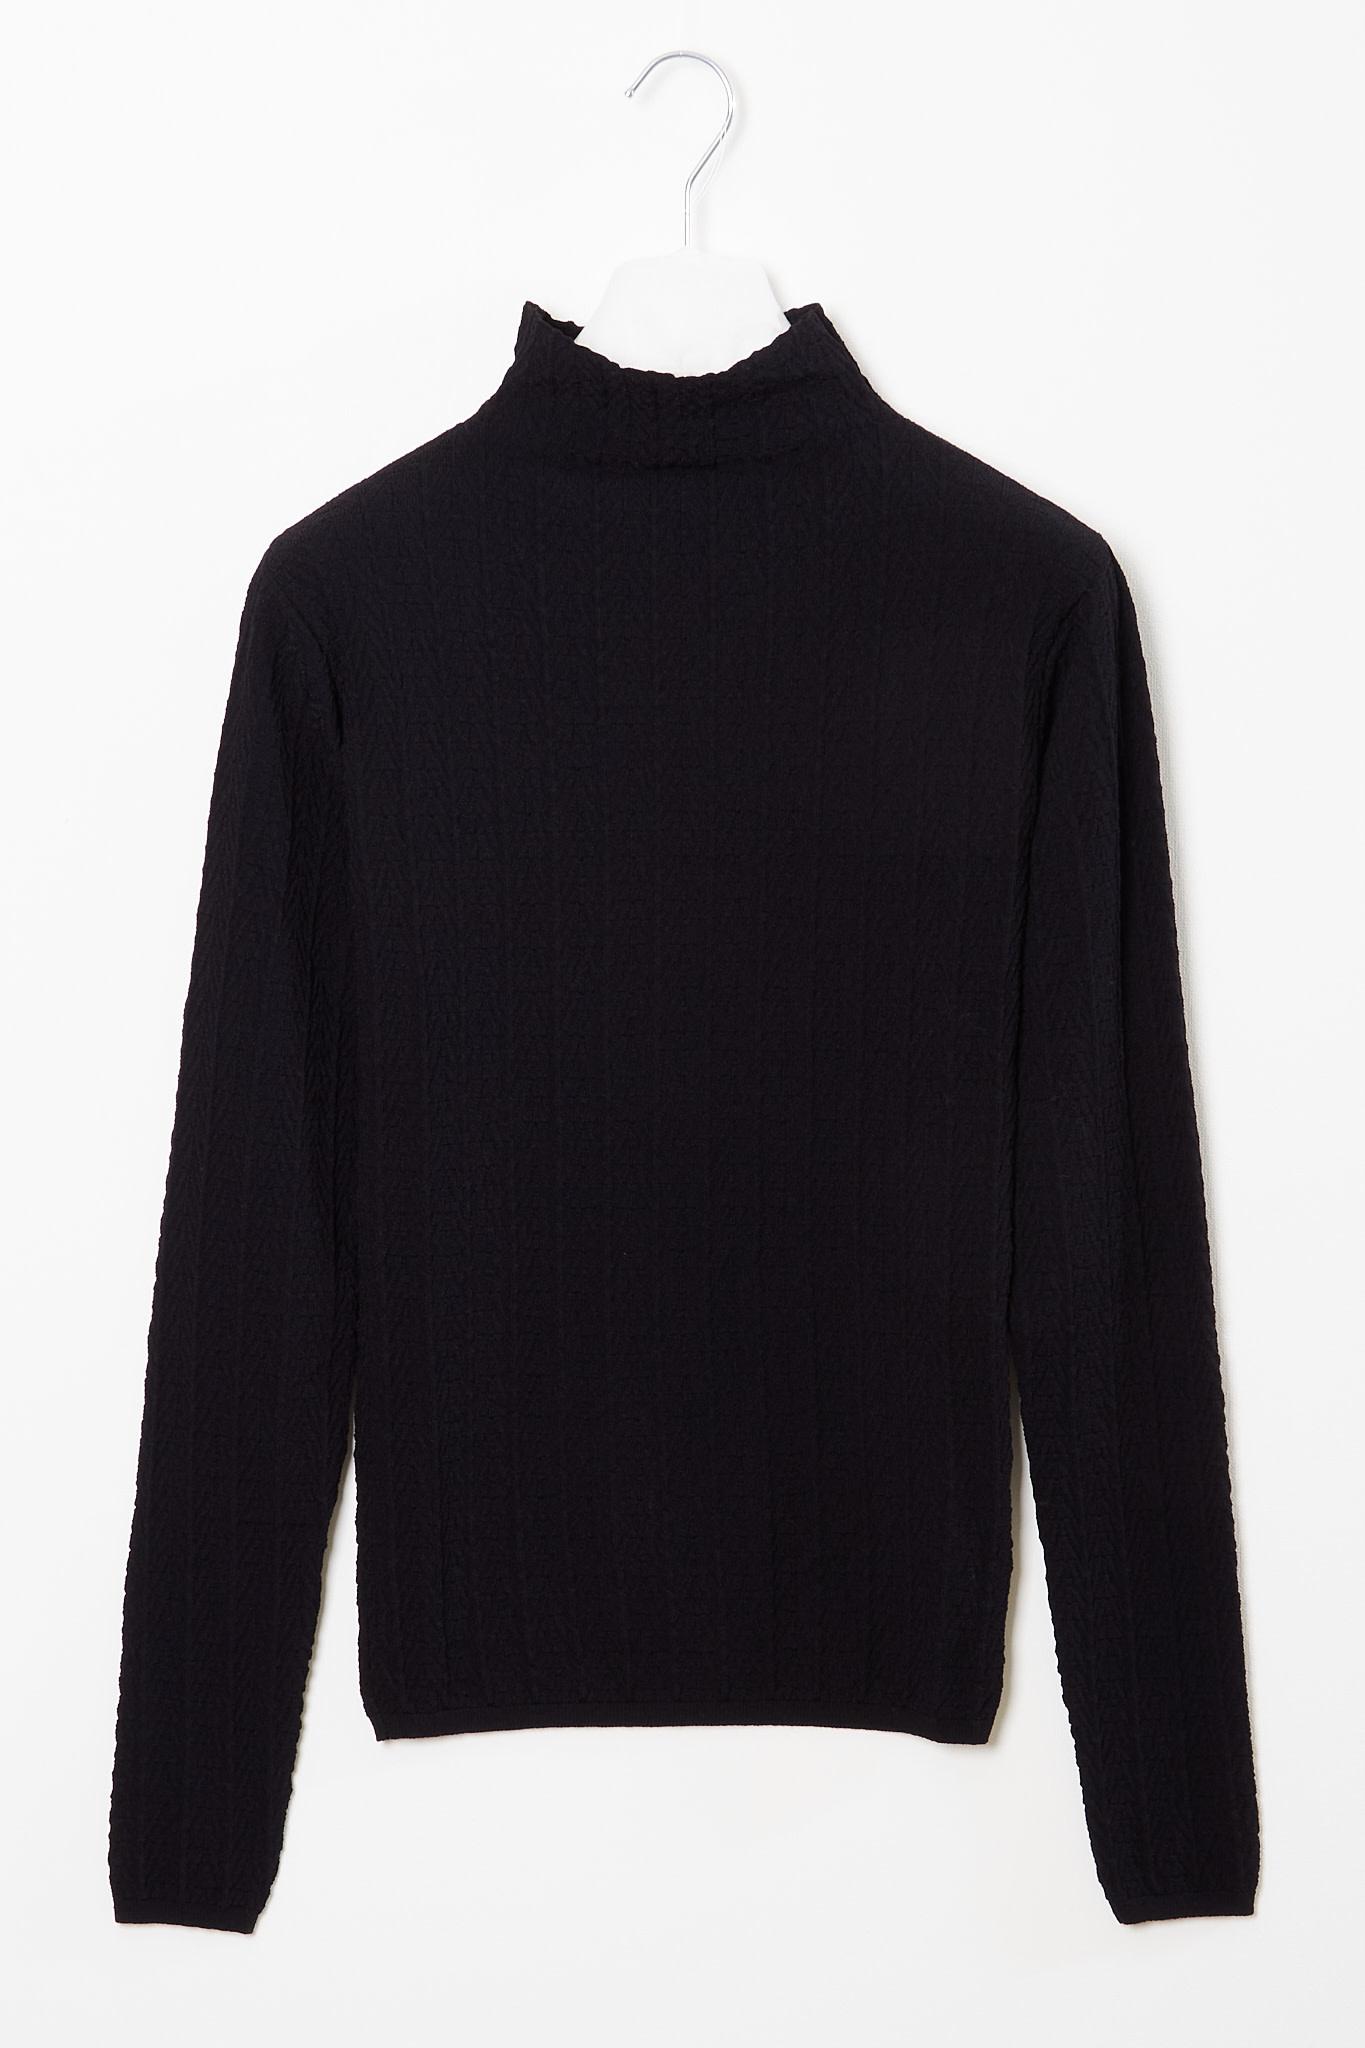 Aeron - Ernesto ribbed knit sweater